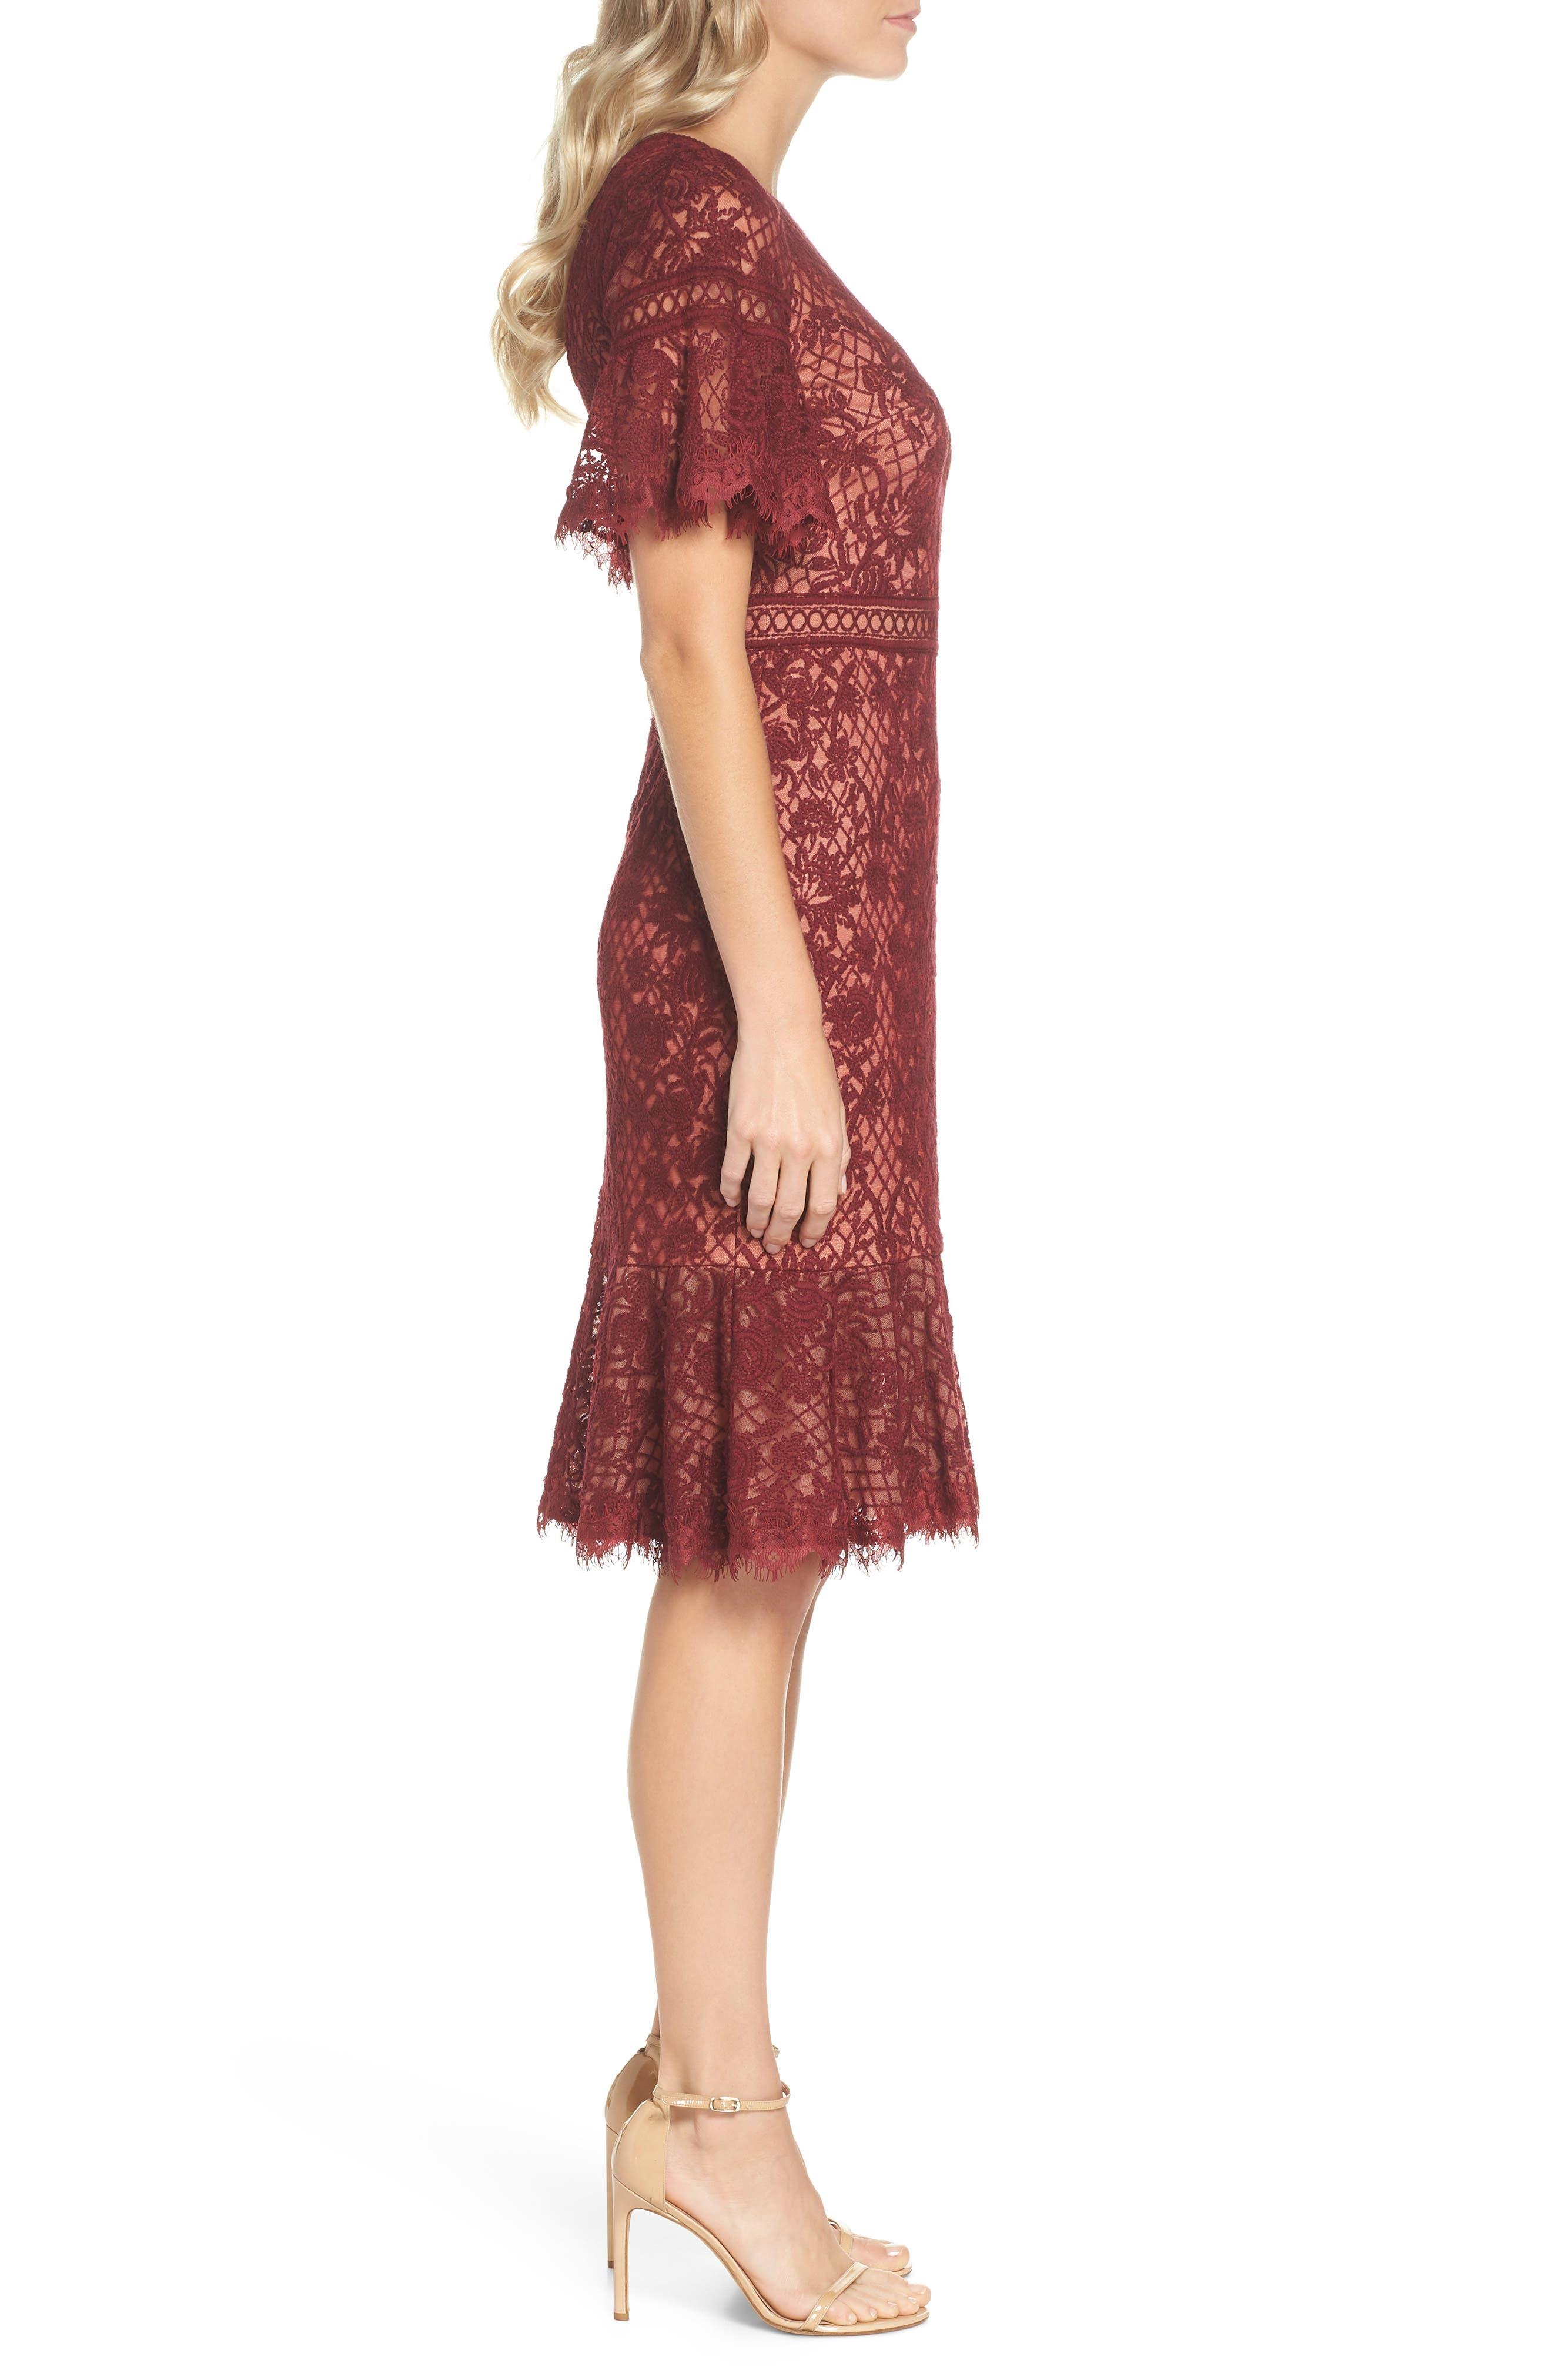 TADASHI SHOJI, Embroidered Mesh Dress, Alternate thumbnail 4, color, 603